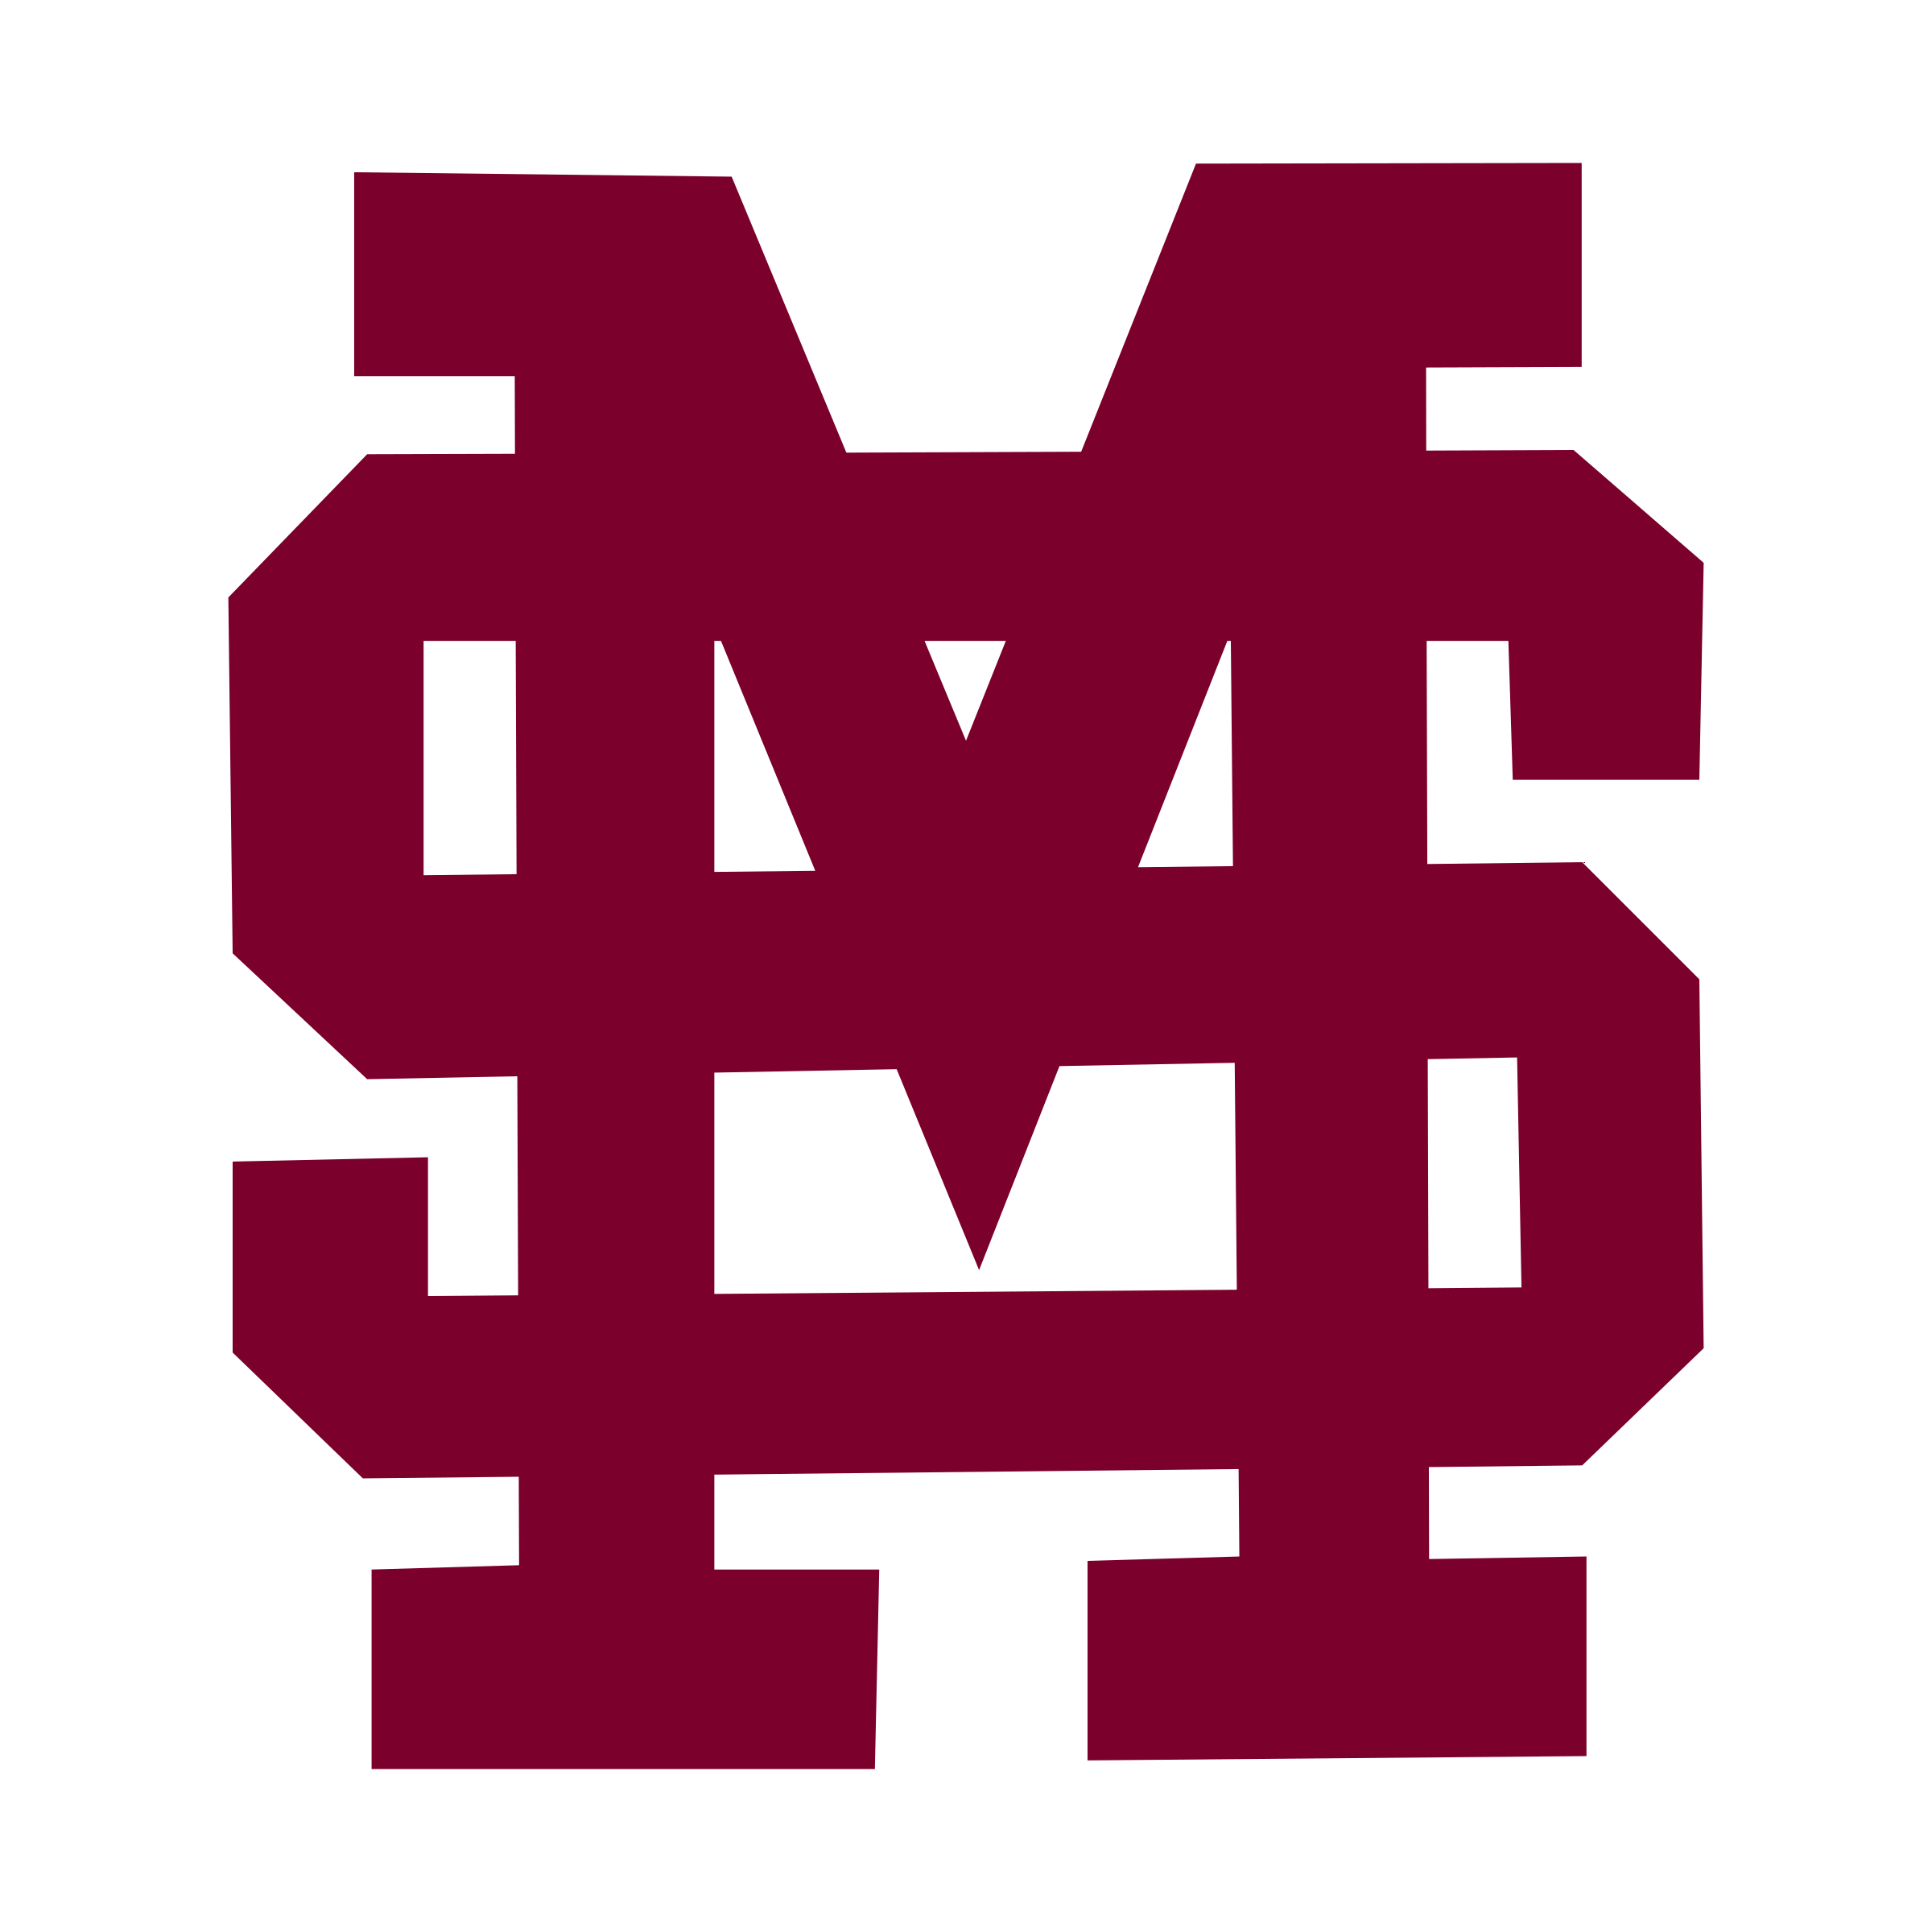 mississippi state bulldogs logo png transparent svg vector rh freebiesupply com mississippi state logo belt mississippi state logo images